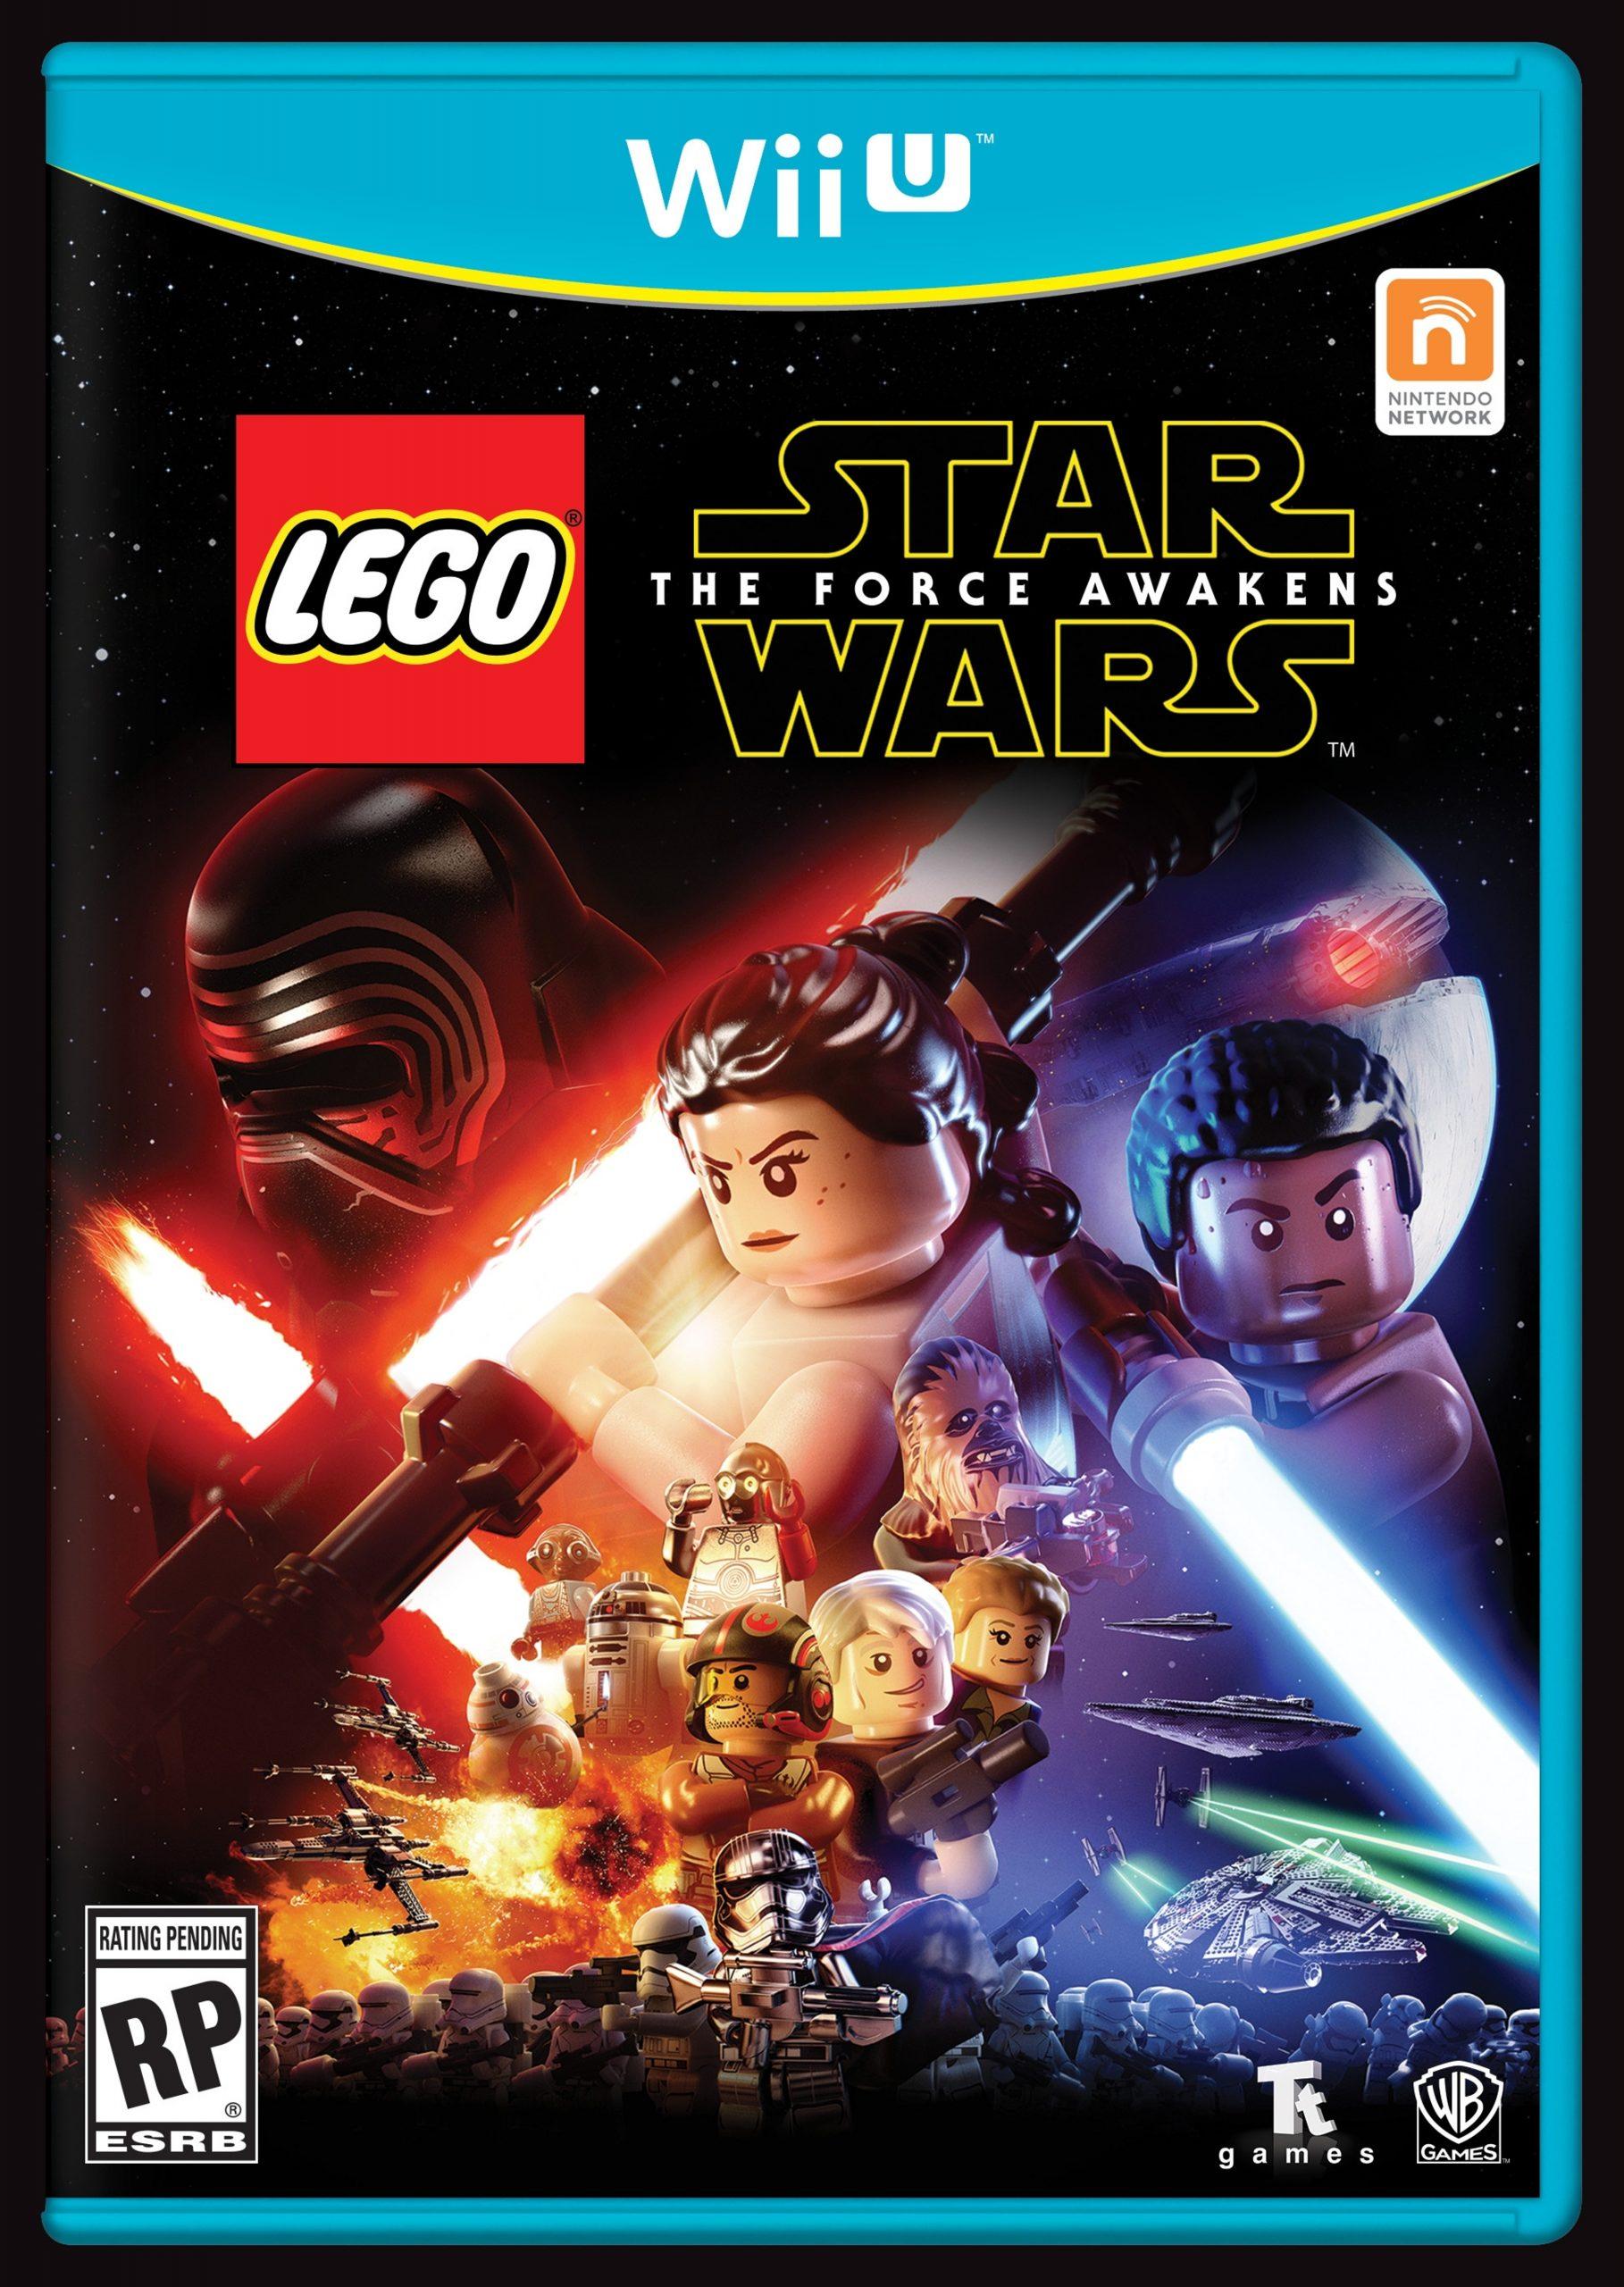 lego 5005141 star wars the force awakens wii u video game scaled